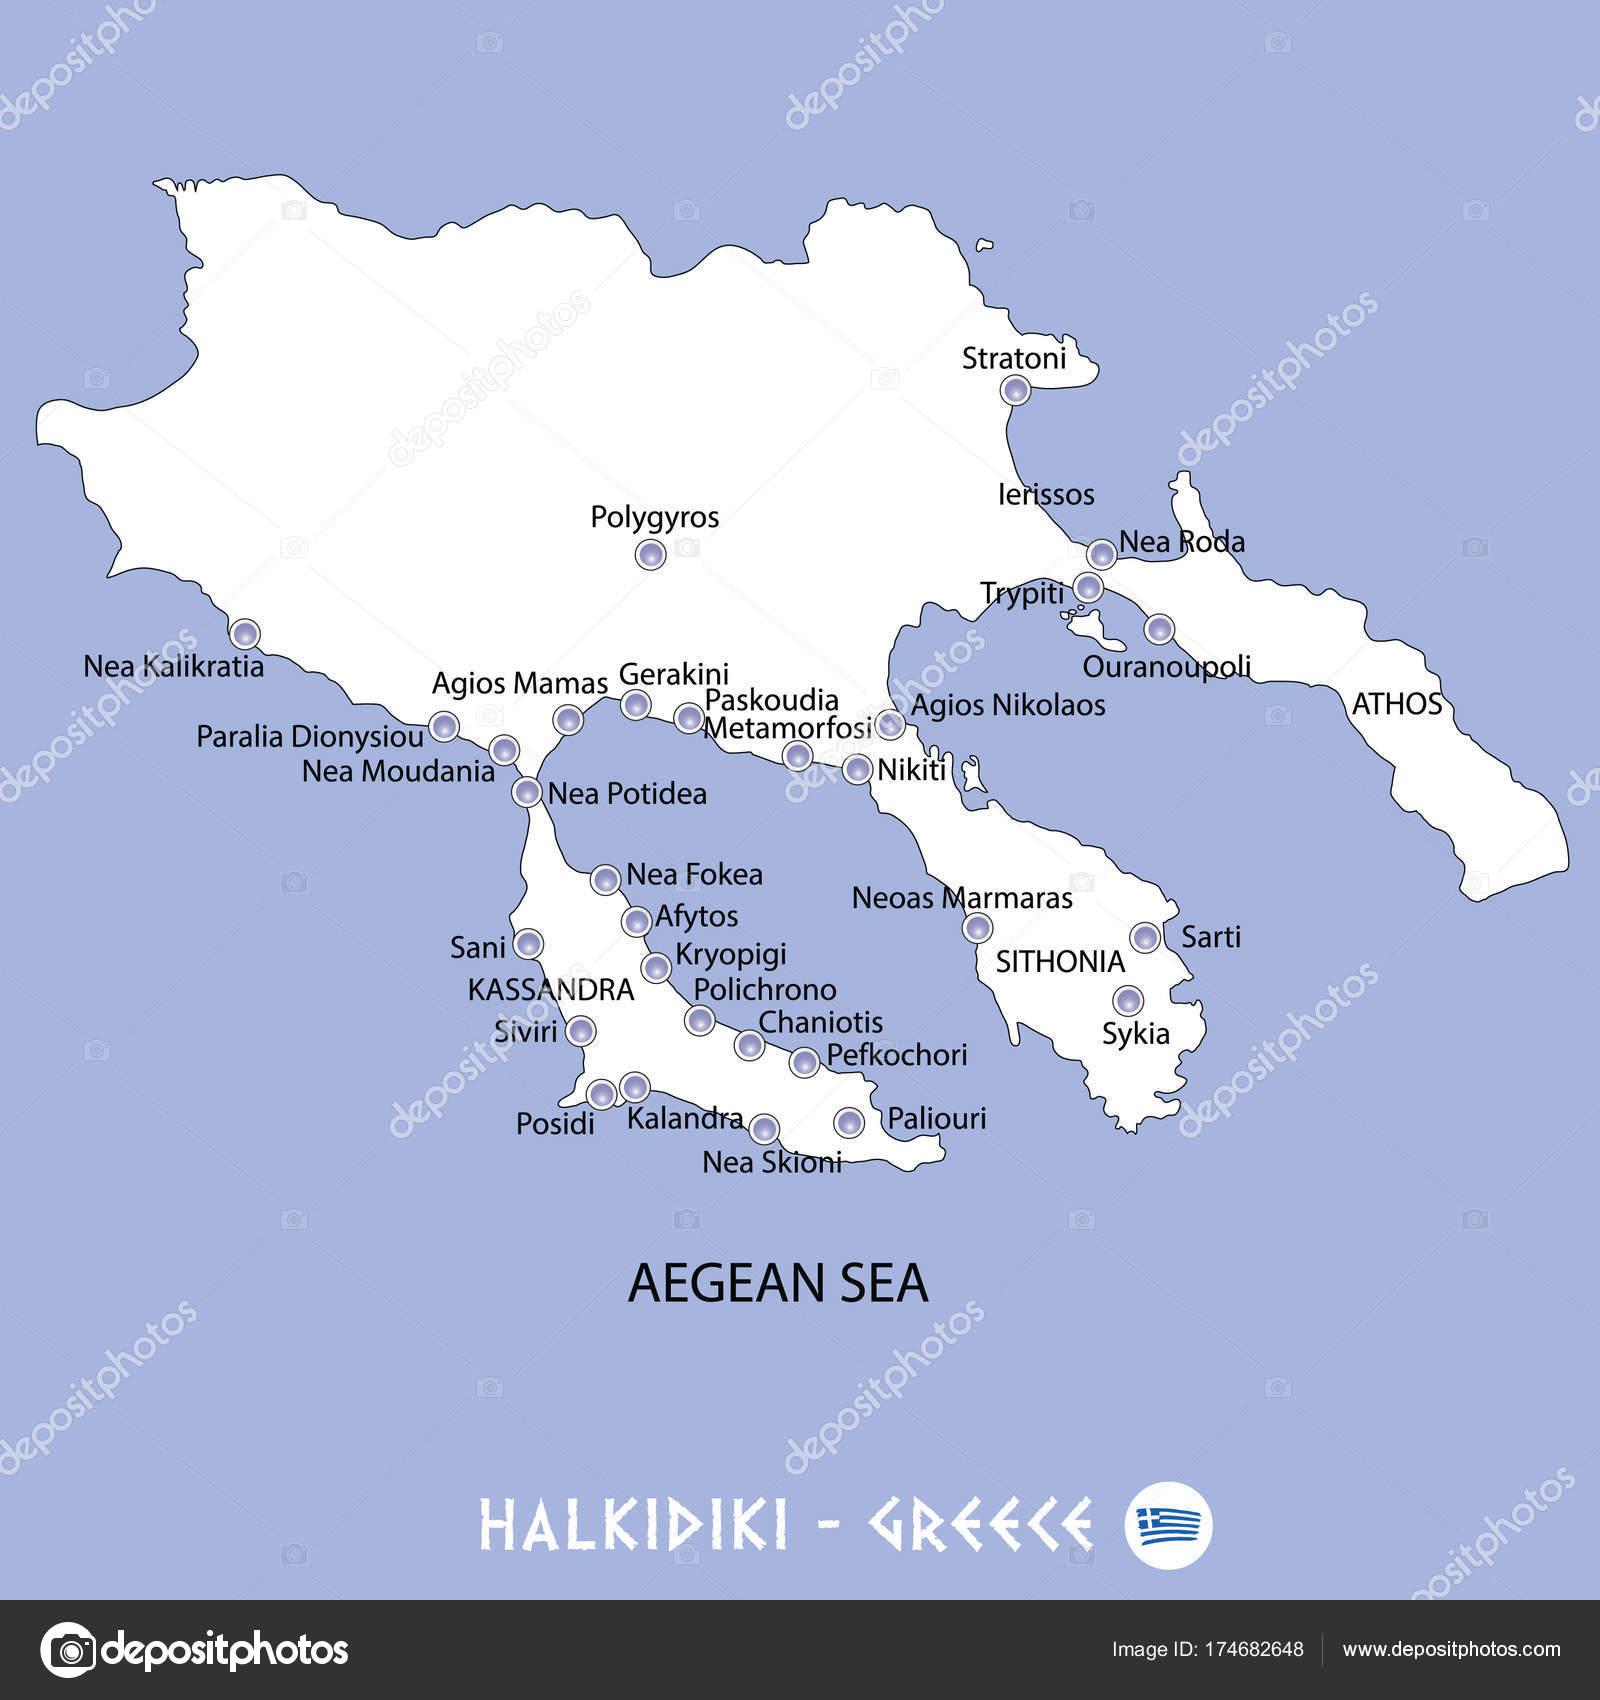 Peninsula of halkidiki in greece white map and blue background i ...